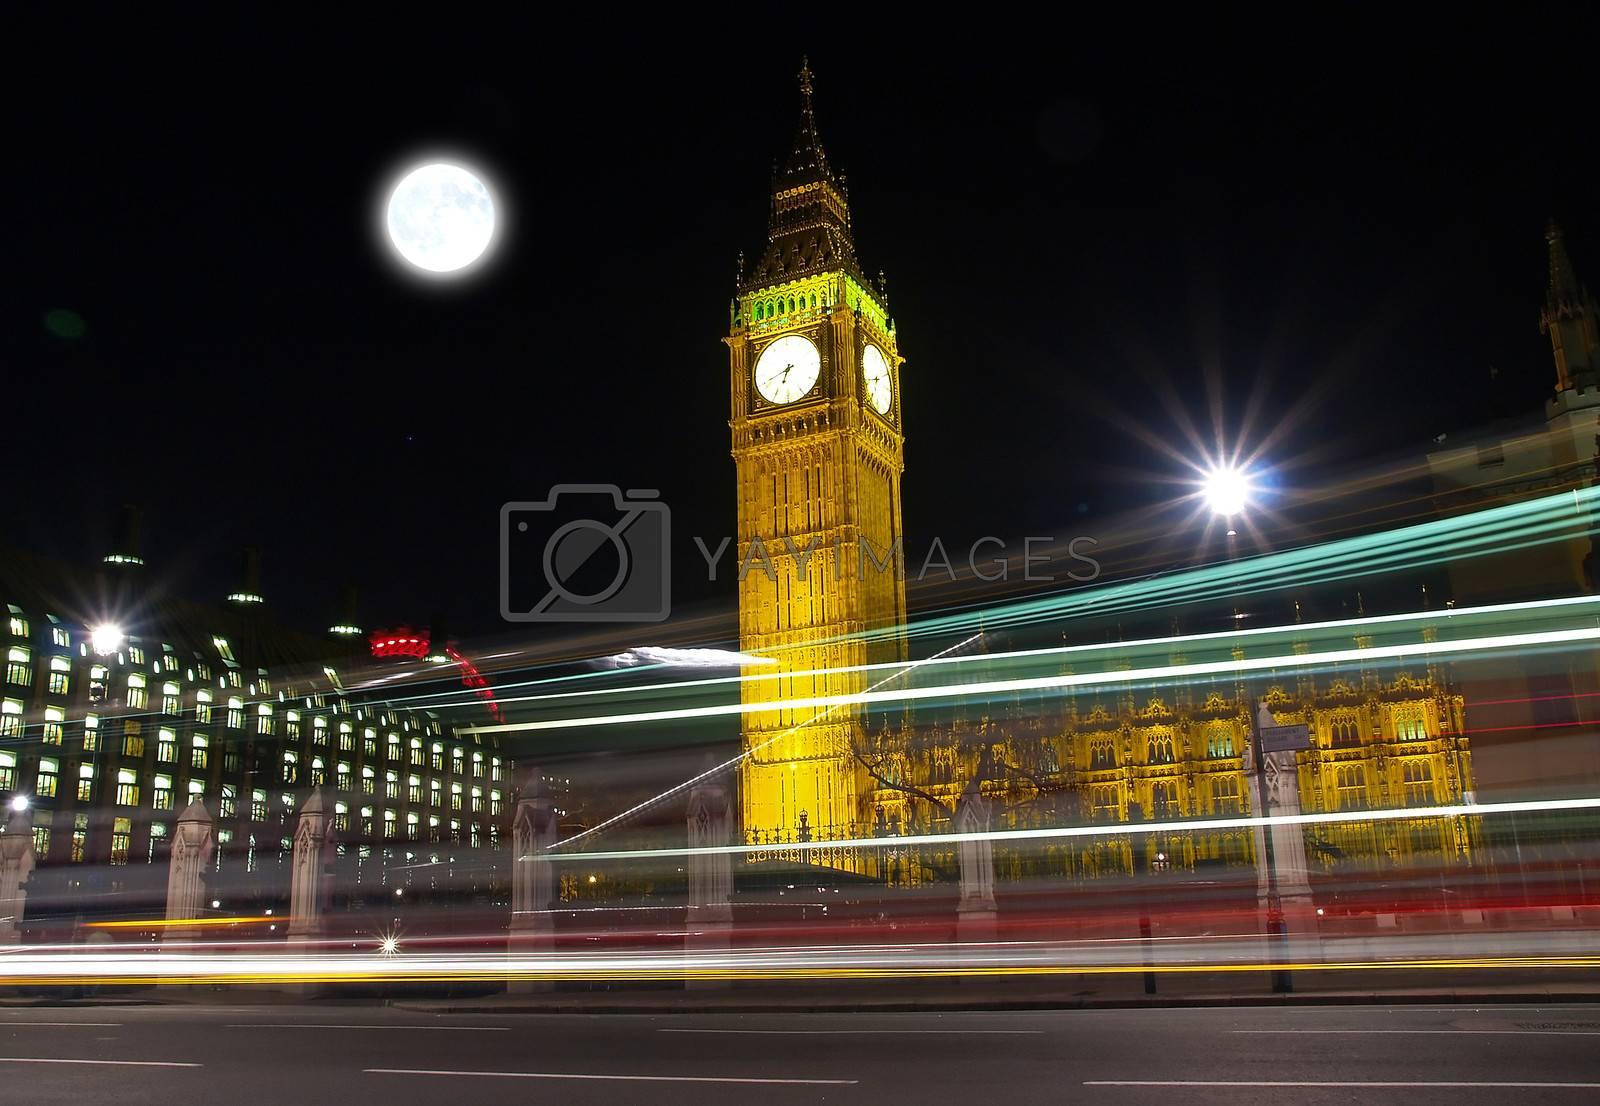 Big Ben at night with bus light tracks